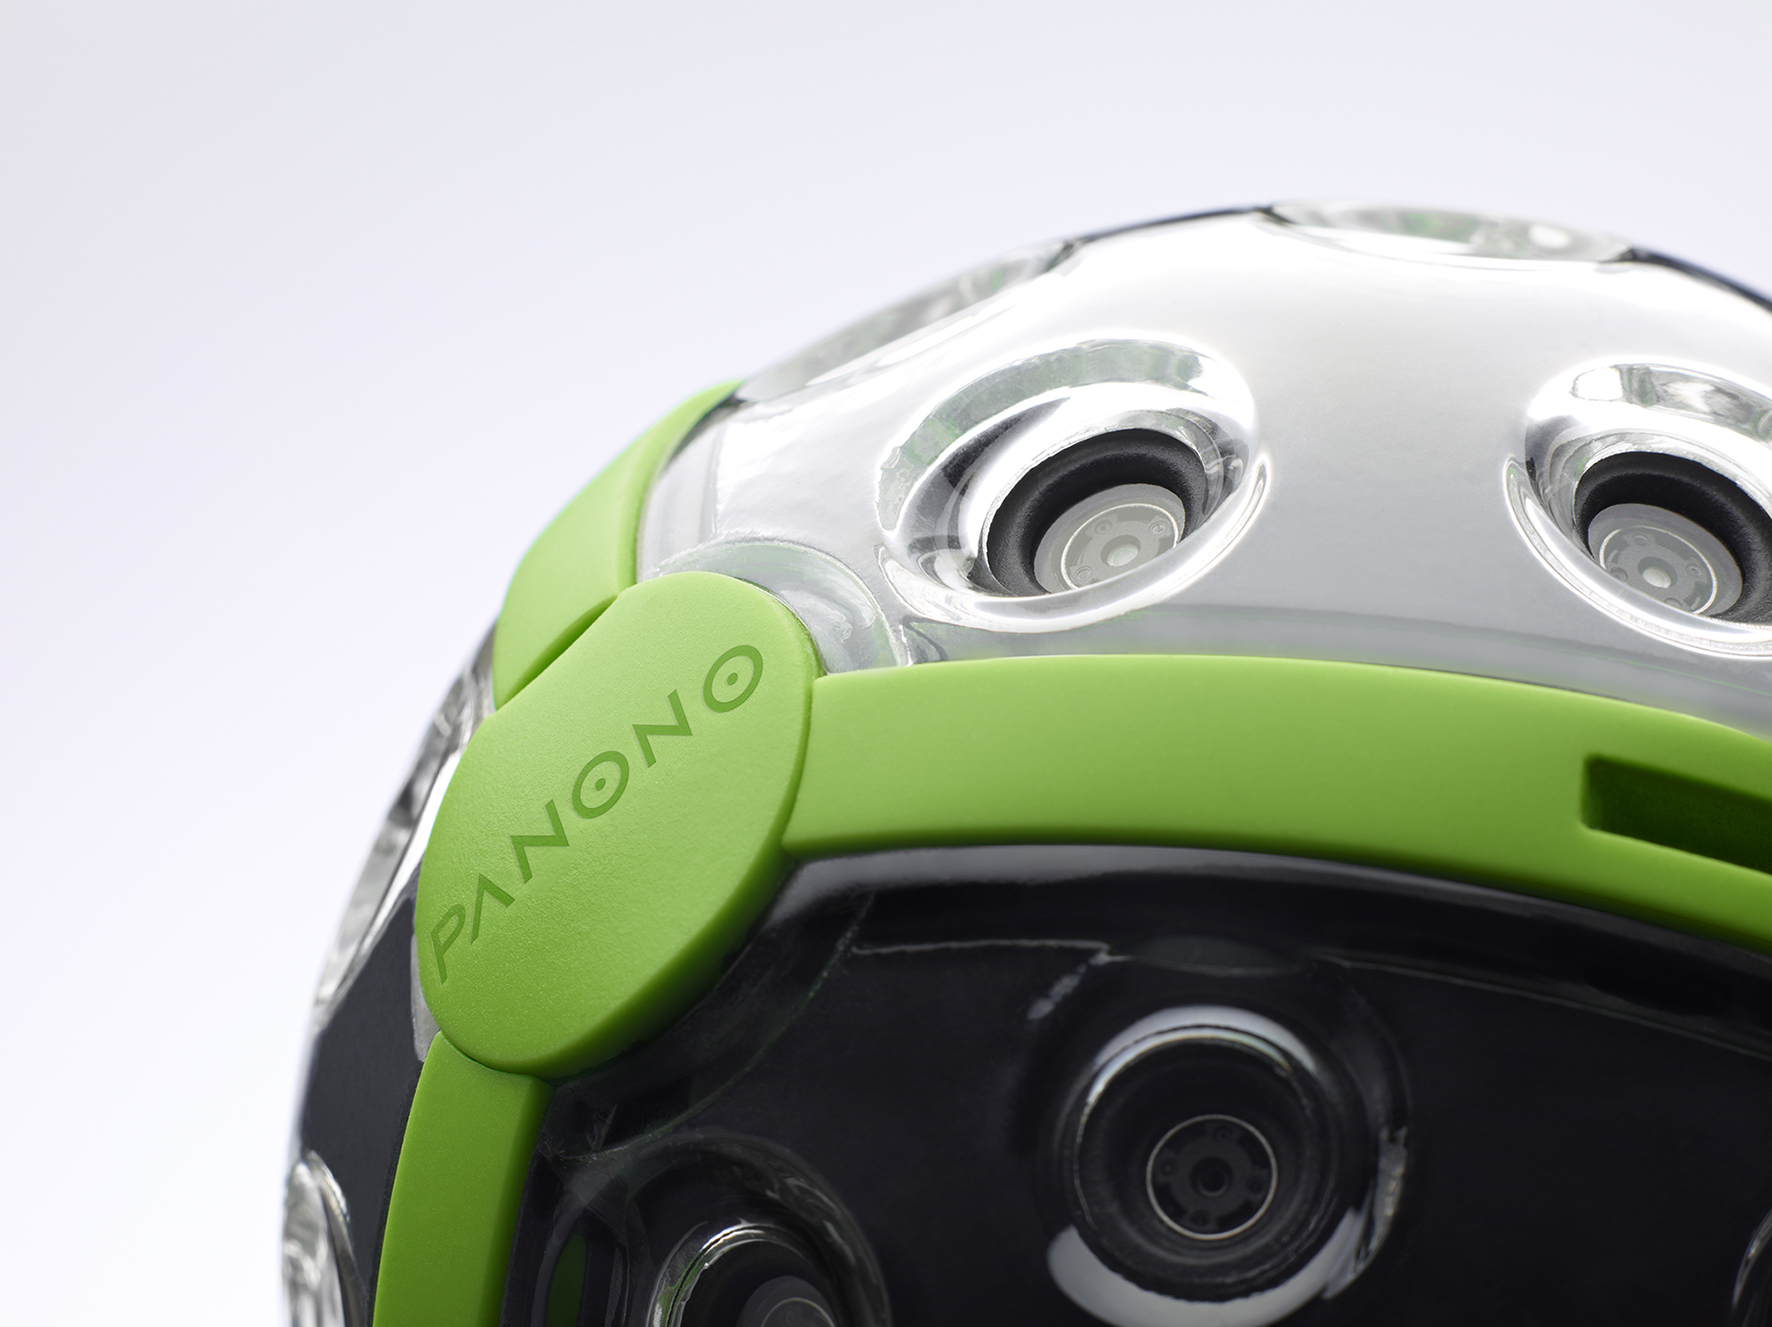 panono ball camera close-up